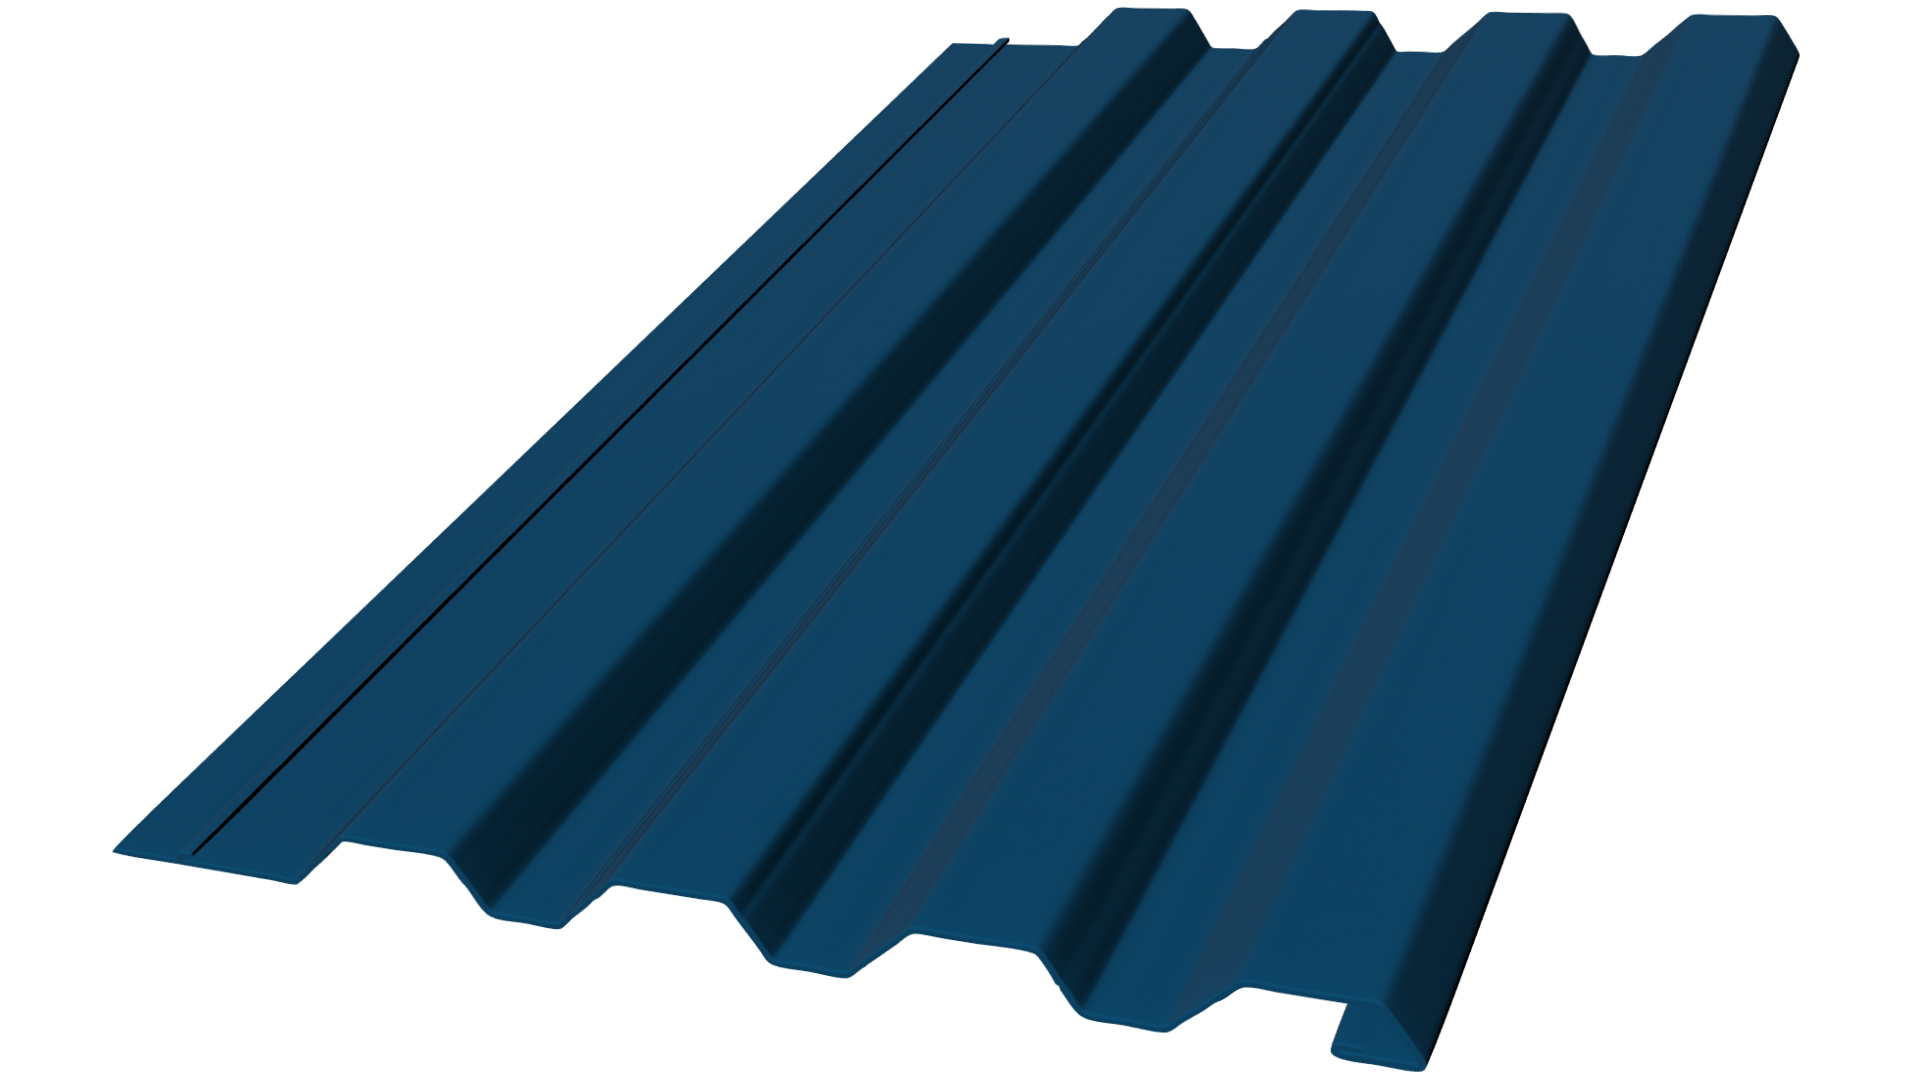 https://f.hubspotusercontent30.net/hubfs/6069238/images/galleries/regal-blue/western-wave-regal-blue-3d.jpg